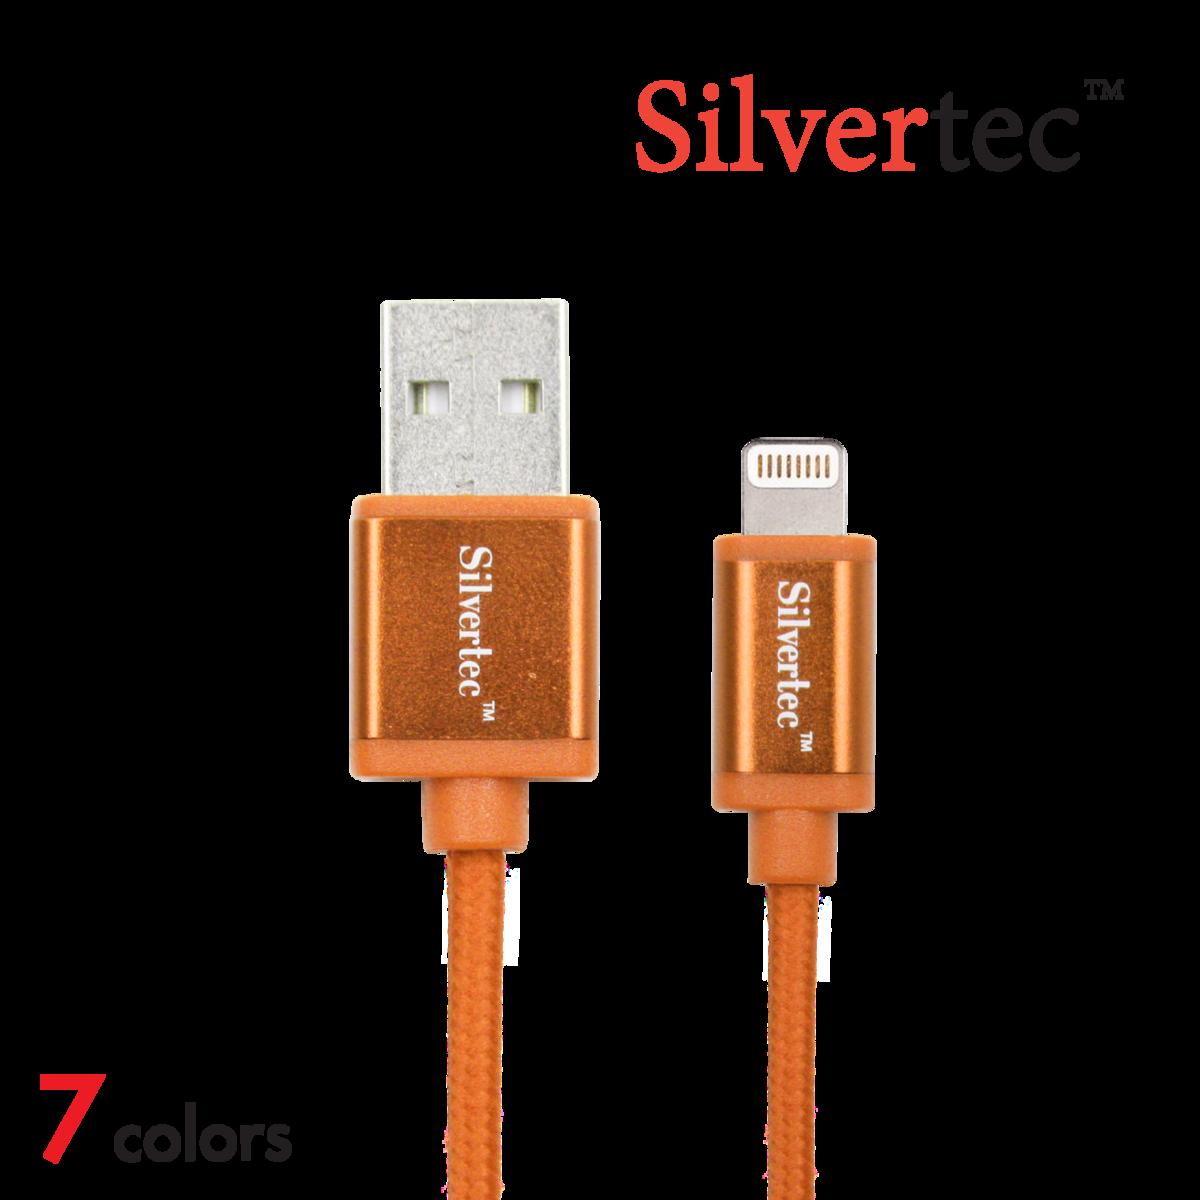 BC-LI0110 1m Lightning USB Cable iPhone Cable 蘋果充電線 iPhone線 (7色)